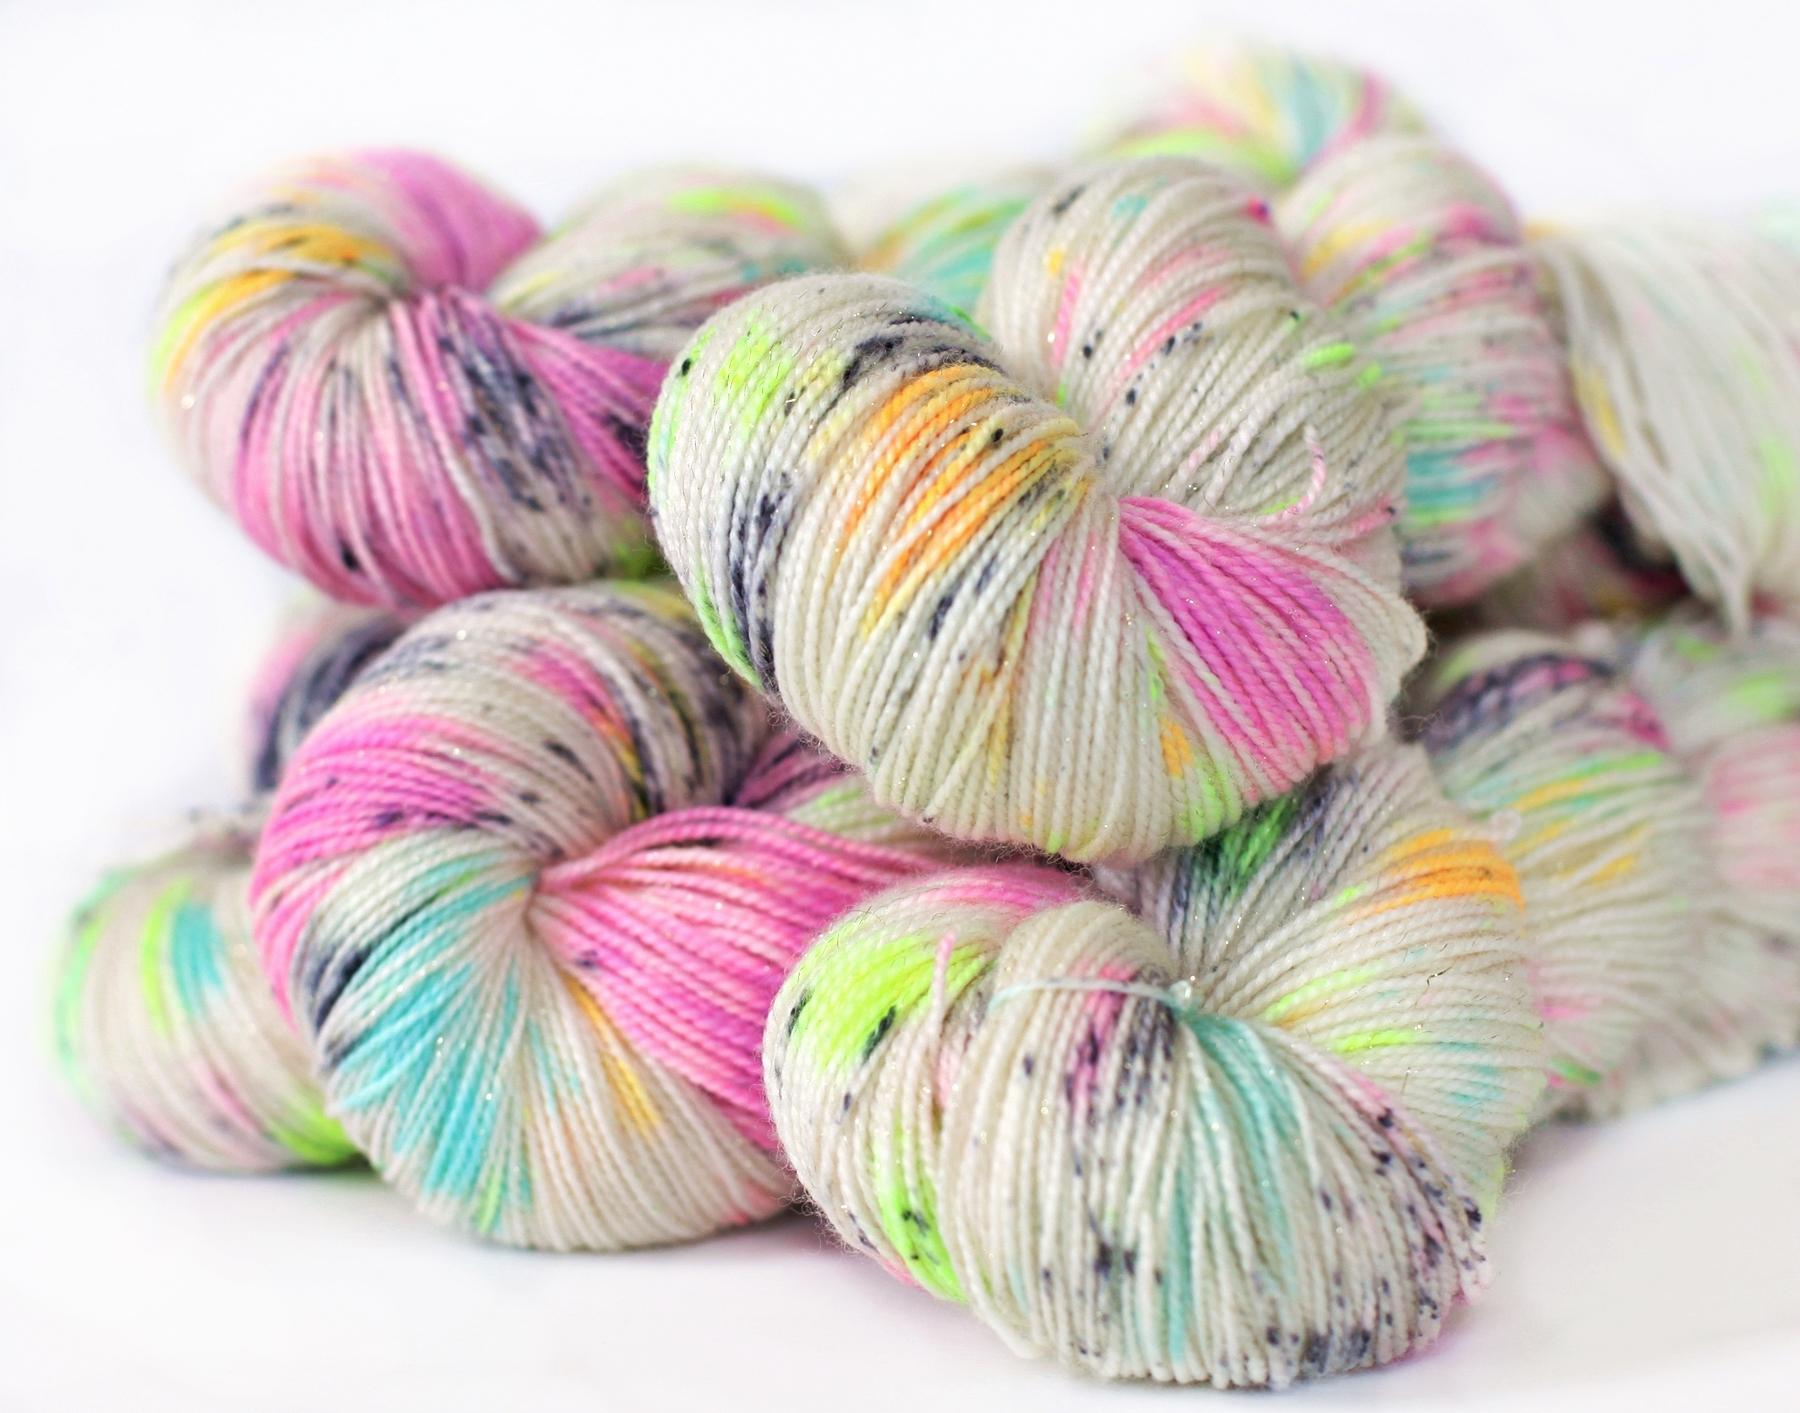 FIZZ BANG on my Glitter Sock yarn base, 463 yards merino/nylon superwash